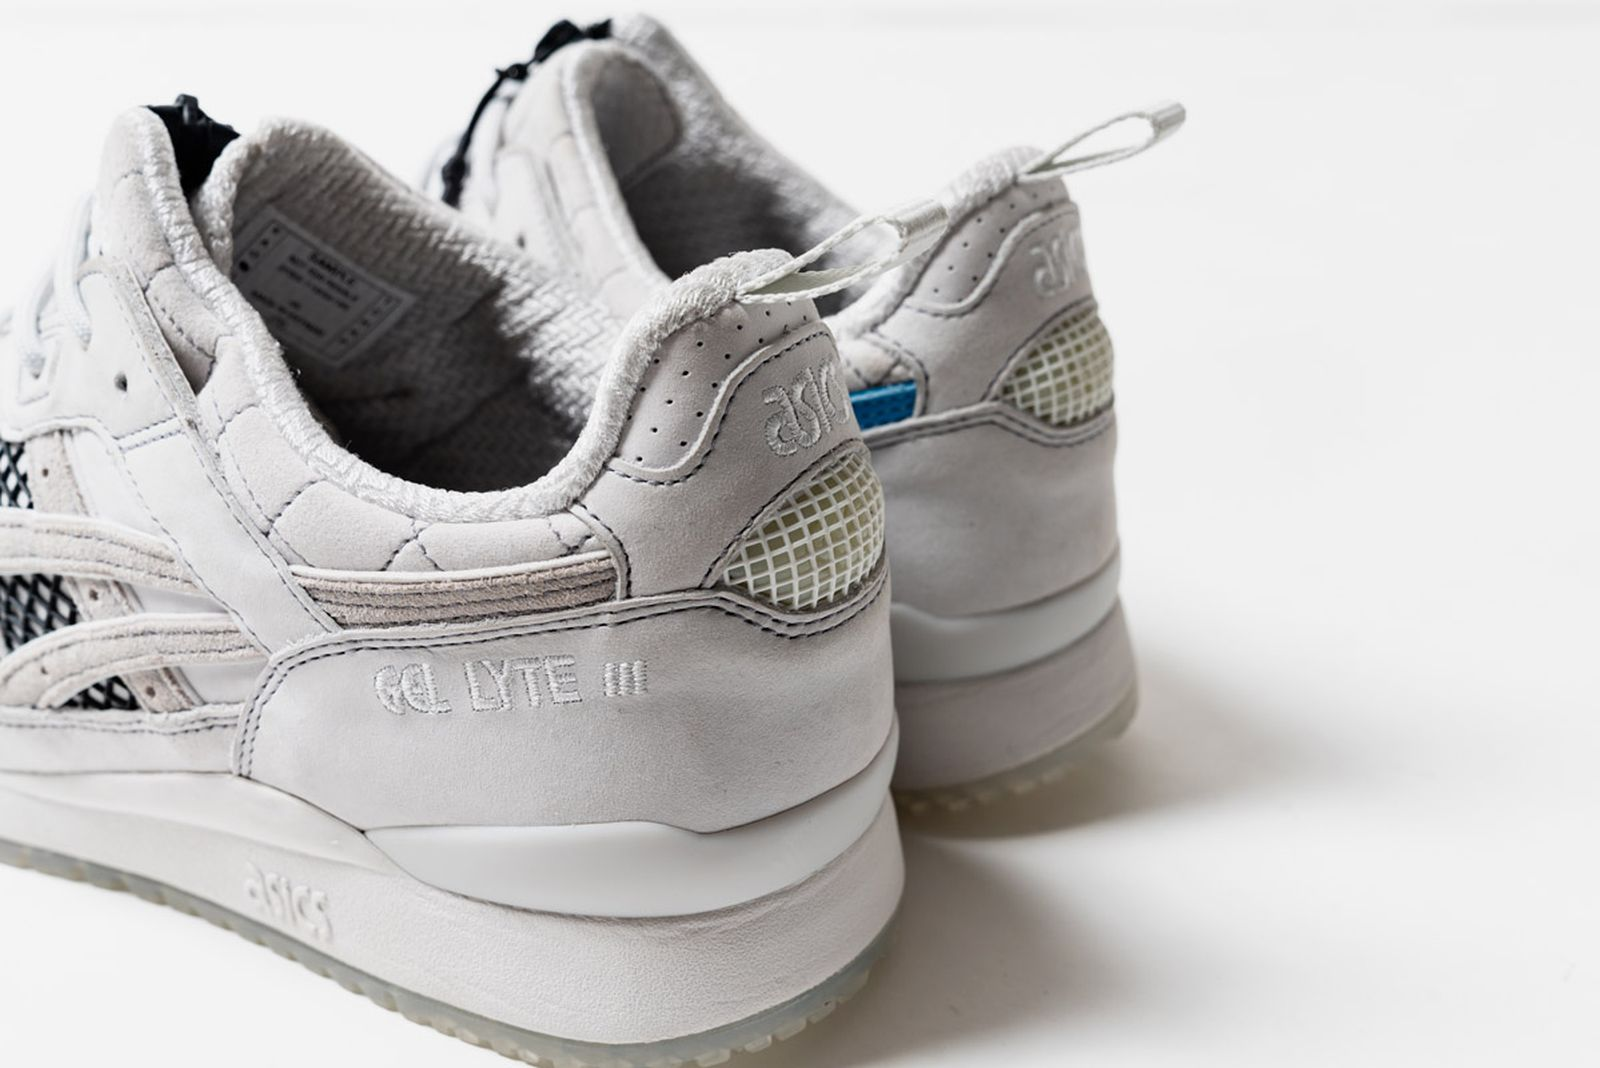 asics-mita-sneakers-gel-lyte-iii-collab-interview-03